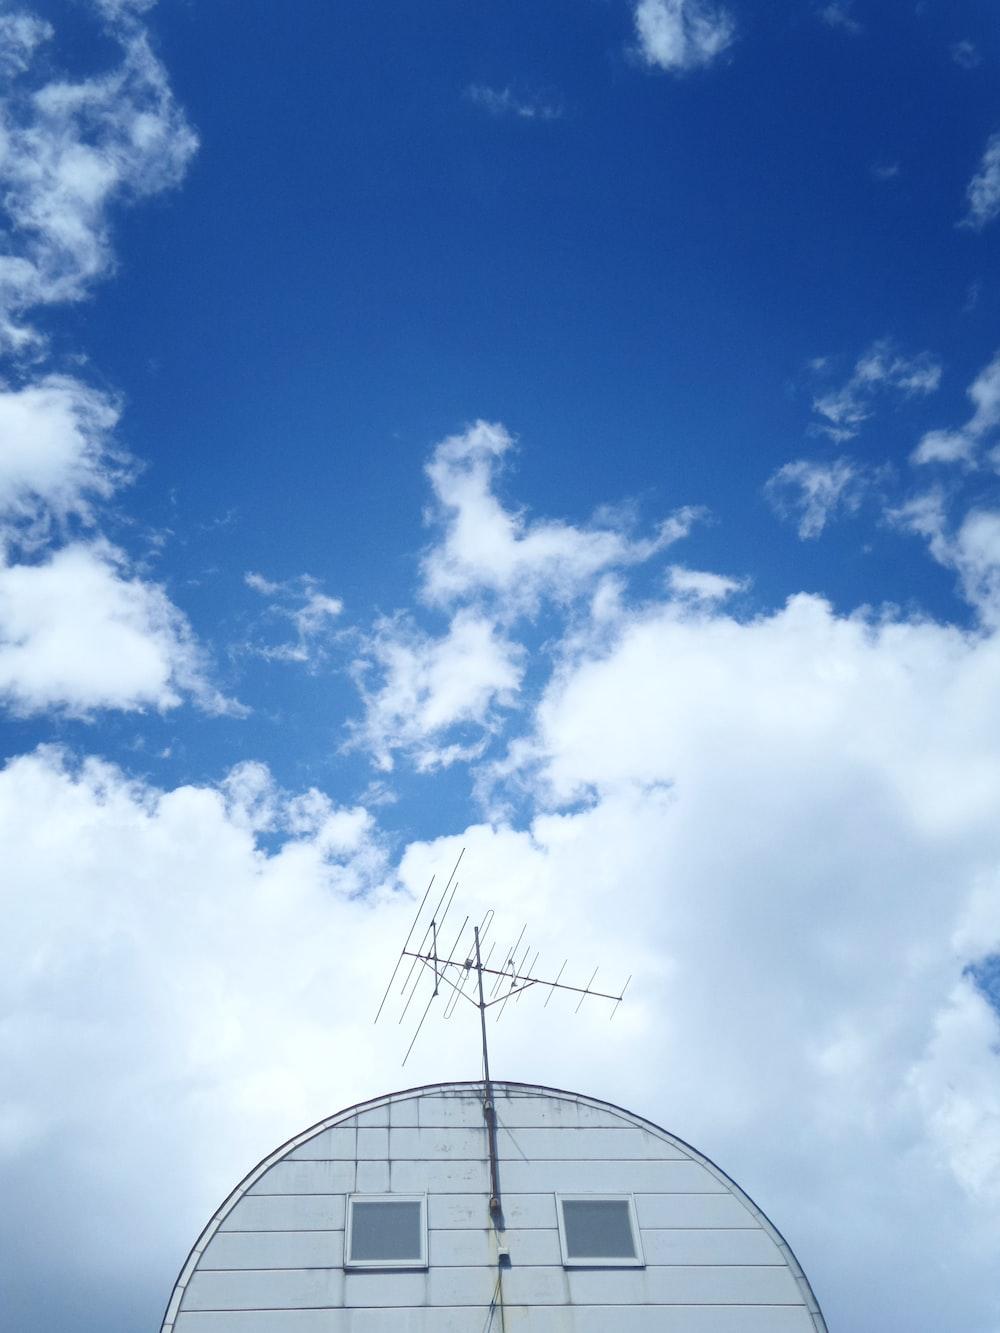 grey antenna on top of white house